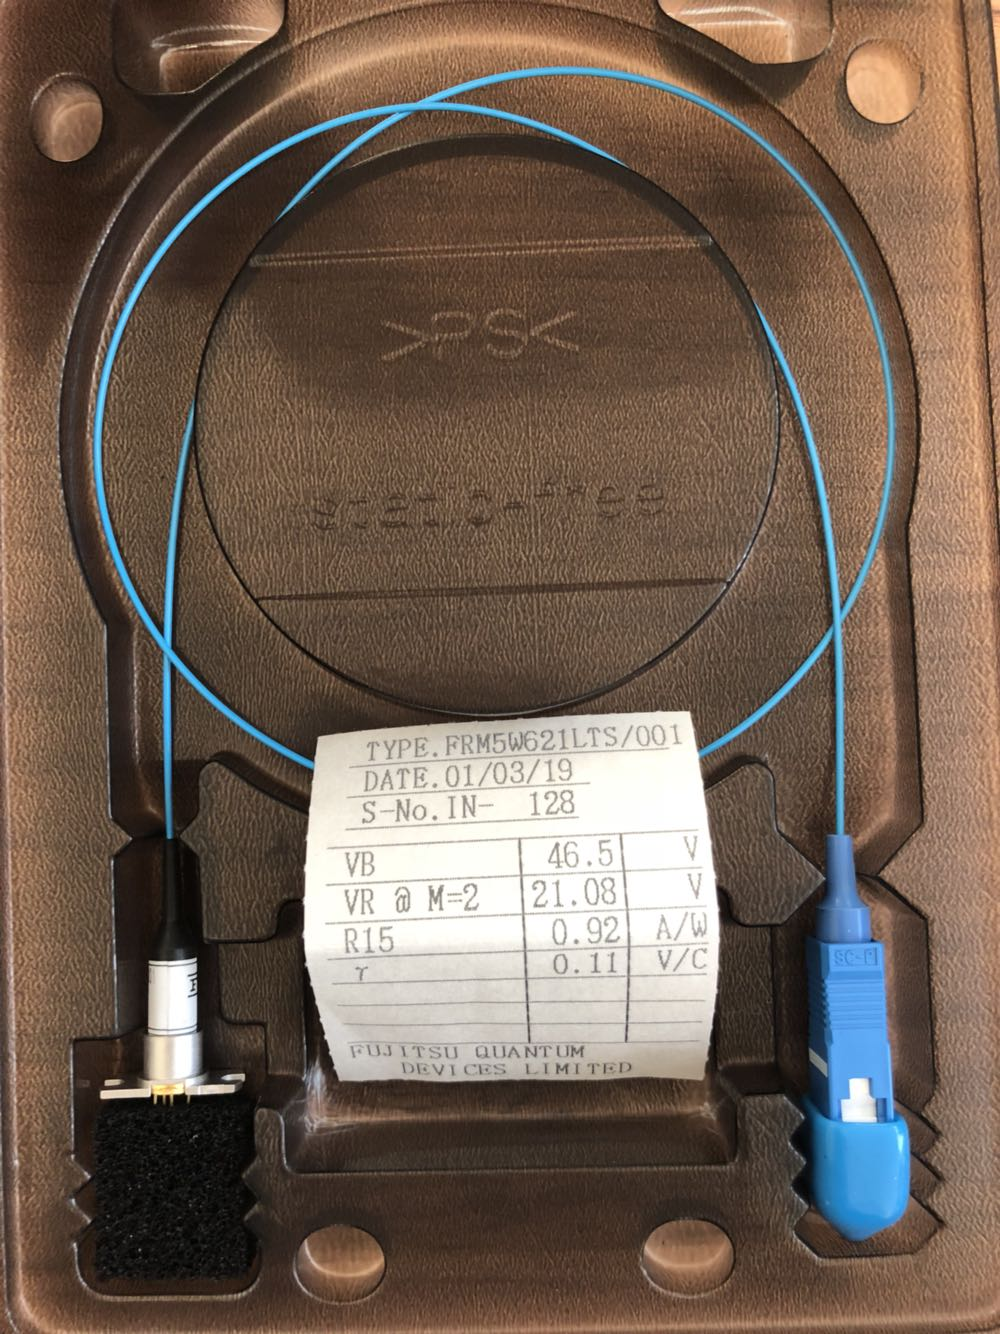 FRM5W621LTS/001 SCPC -34dbm 2.7Gb/s APD fiber photodiode